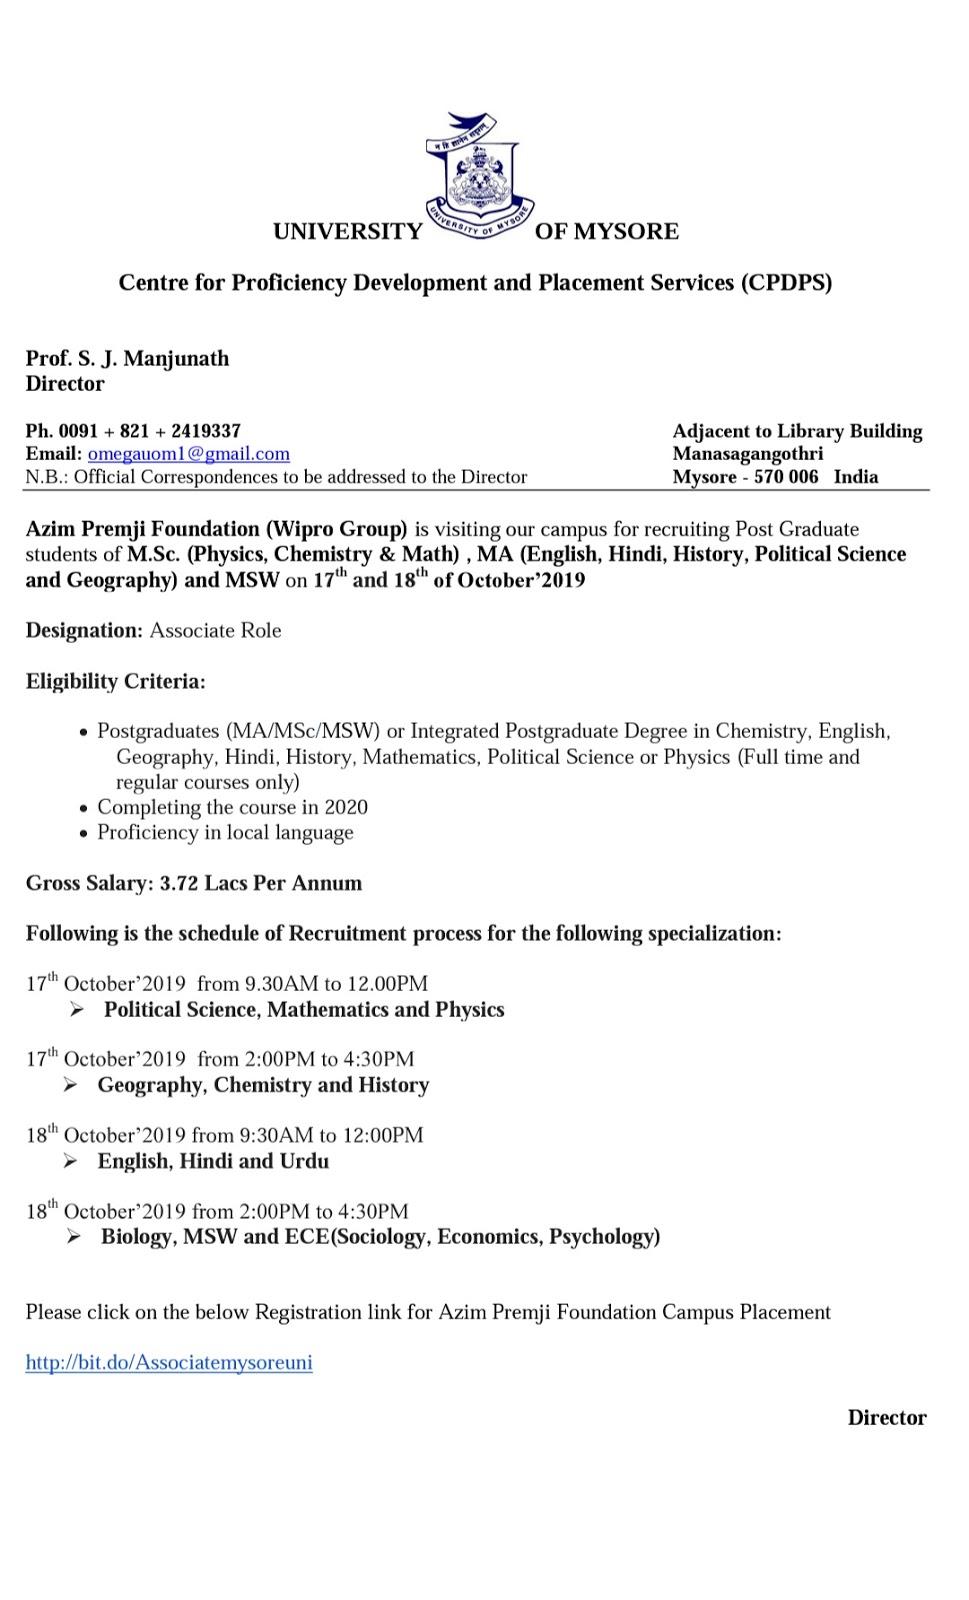 University of Mysore-Azim prameji Foundation Campus Recruitment Announcement